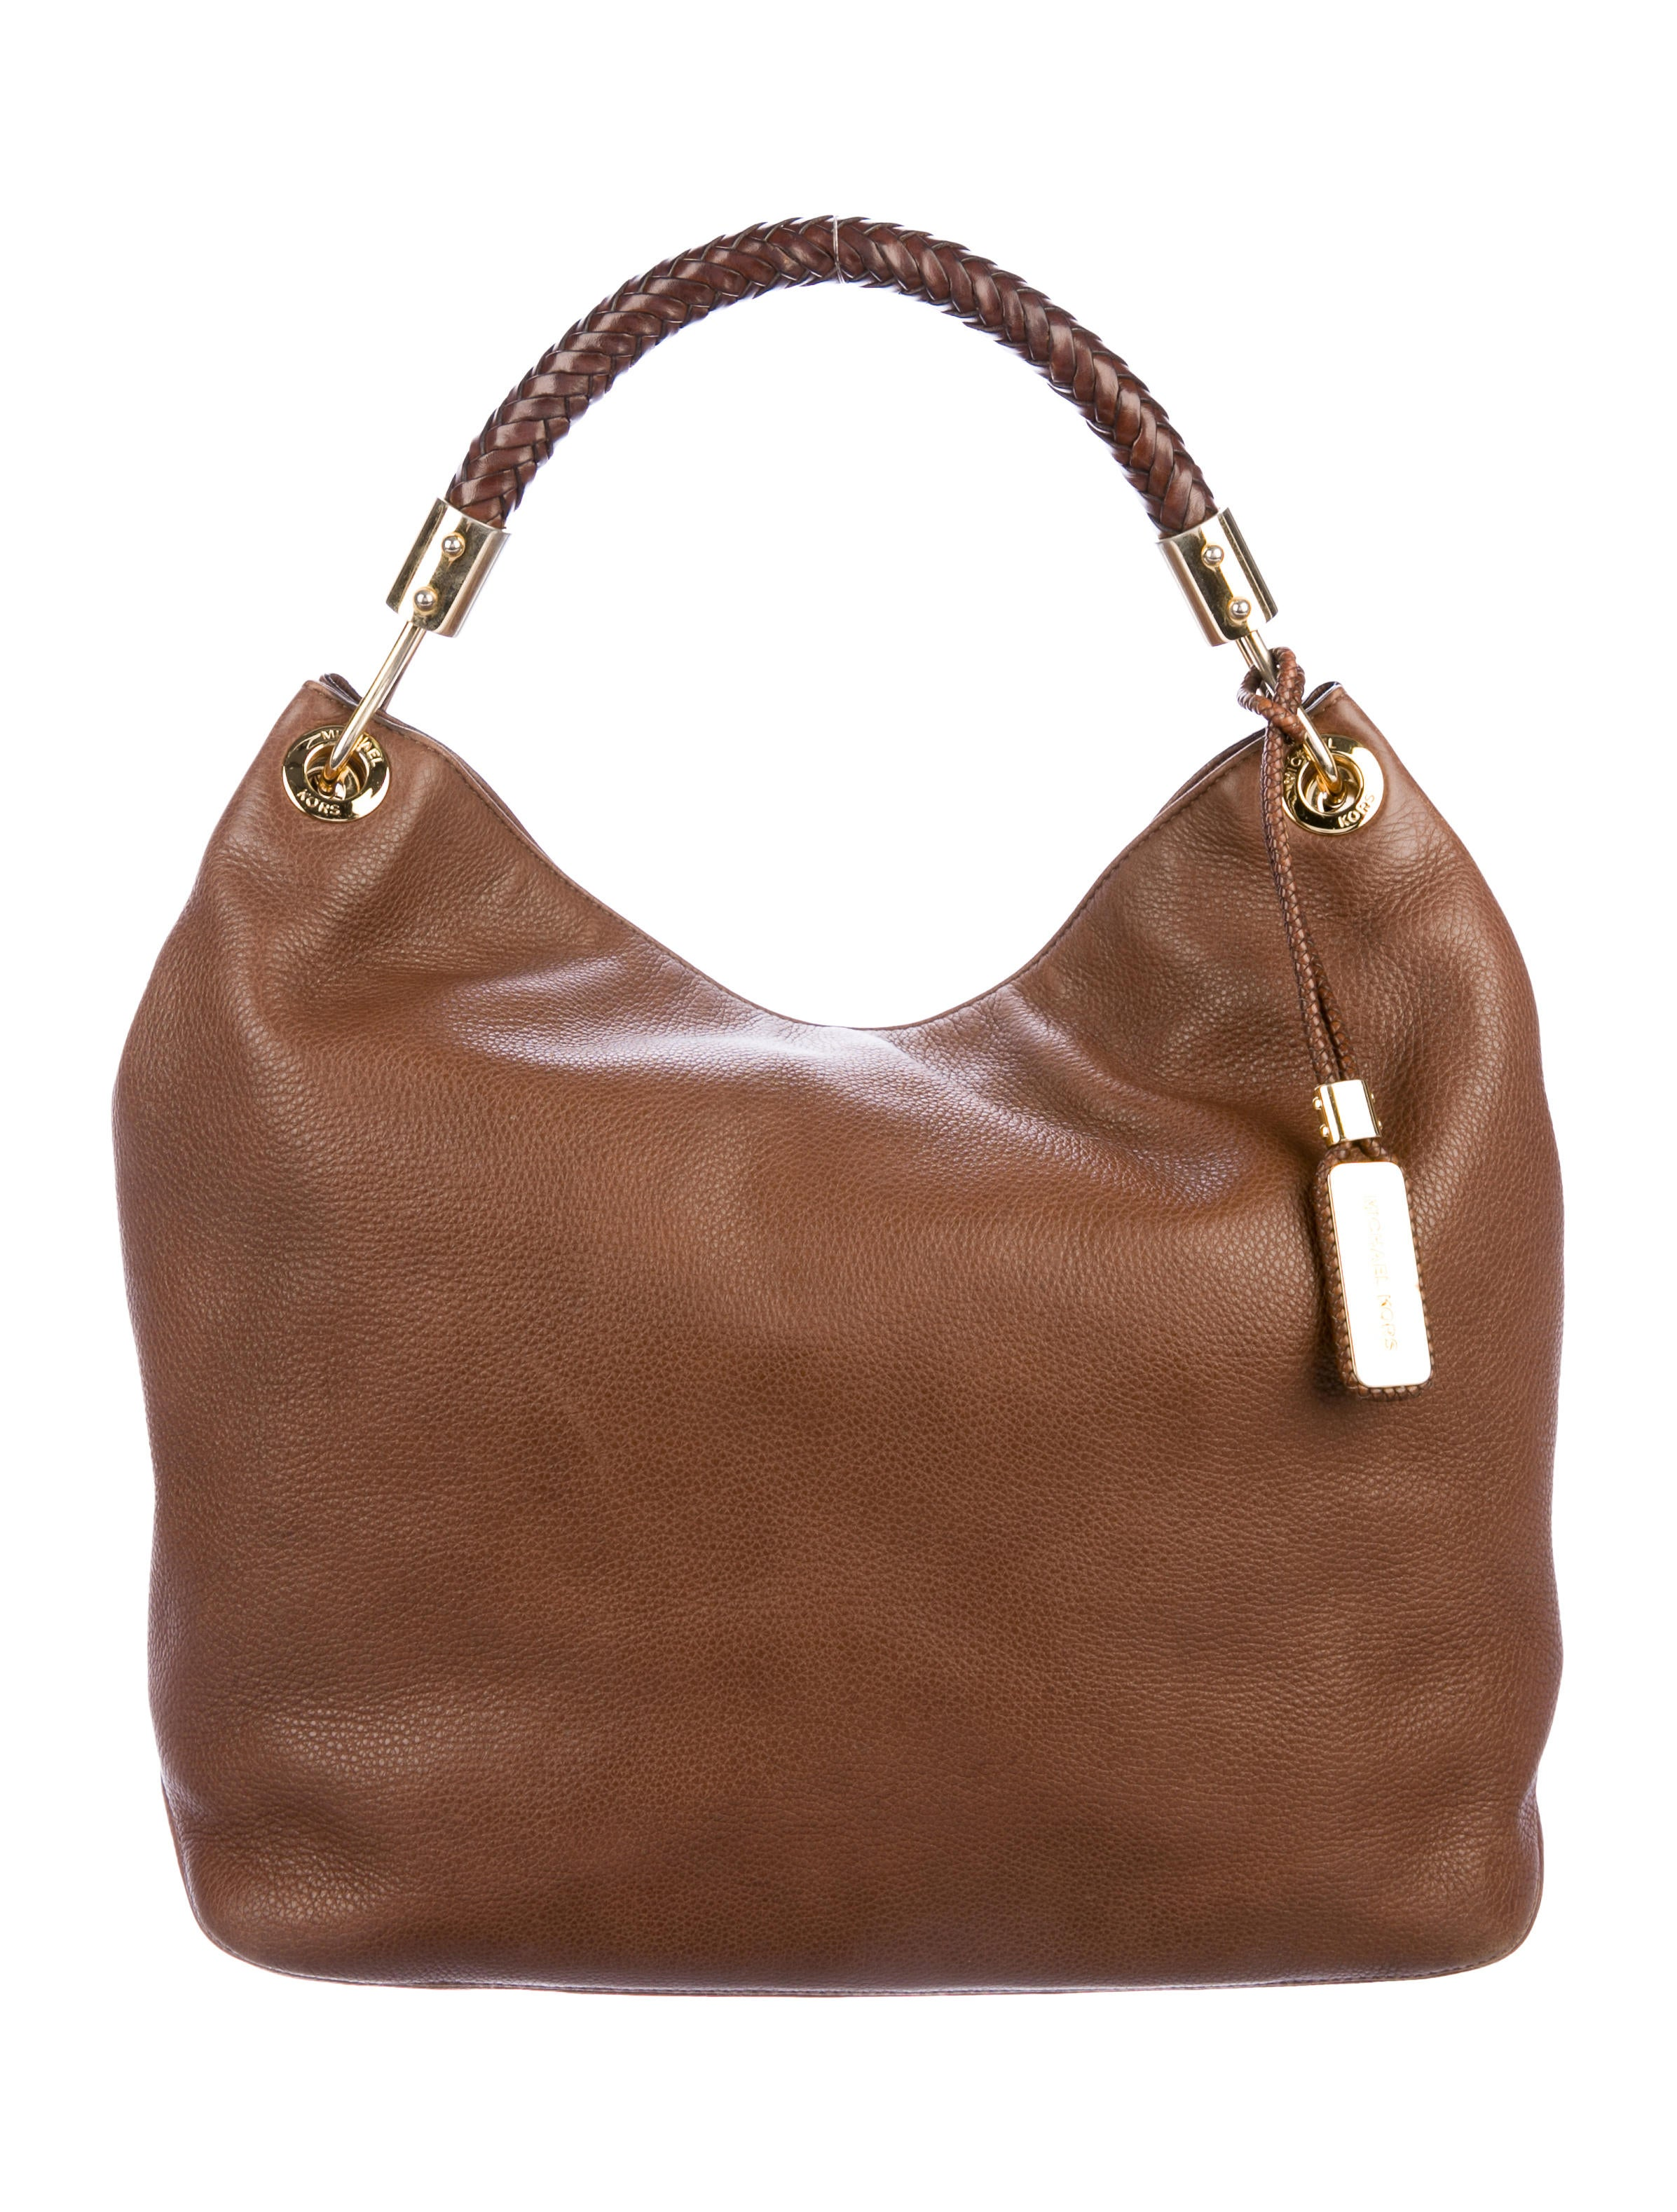 098402af8bb4 Michael Kors Skorpios Leather Hobo - Handbags - MIC76194 | The RealReal